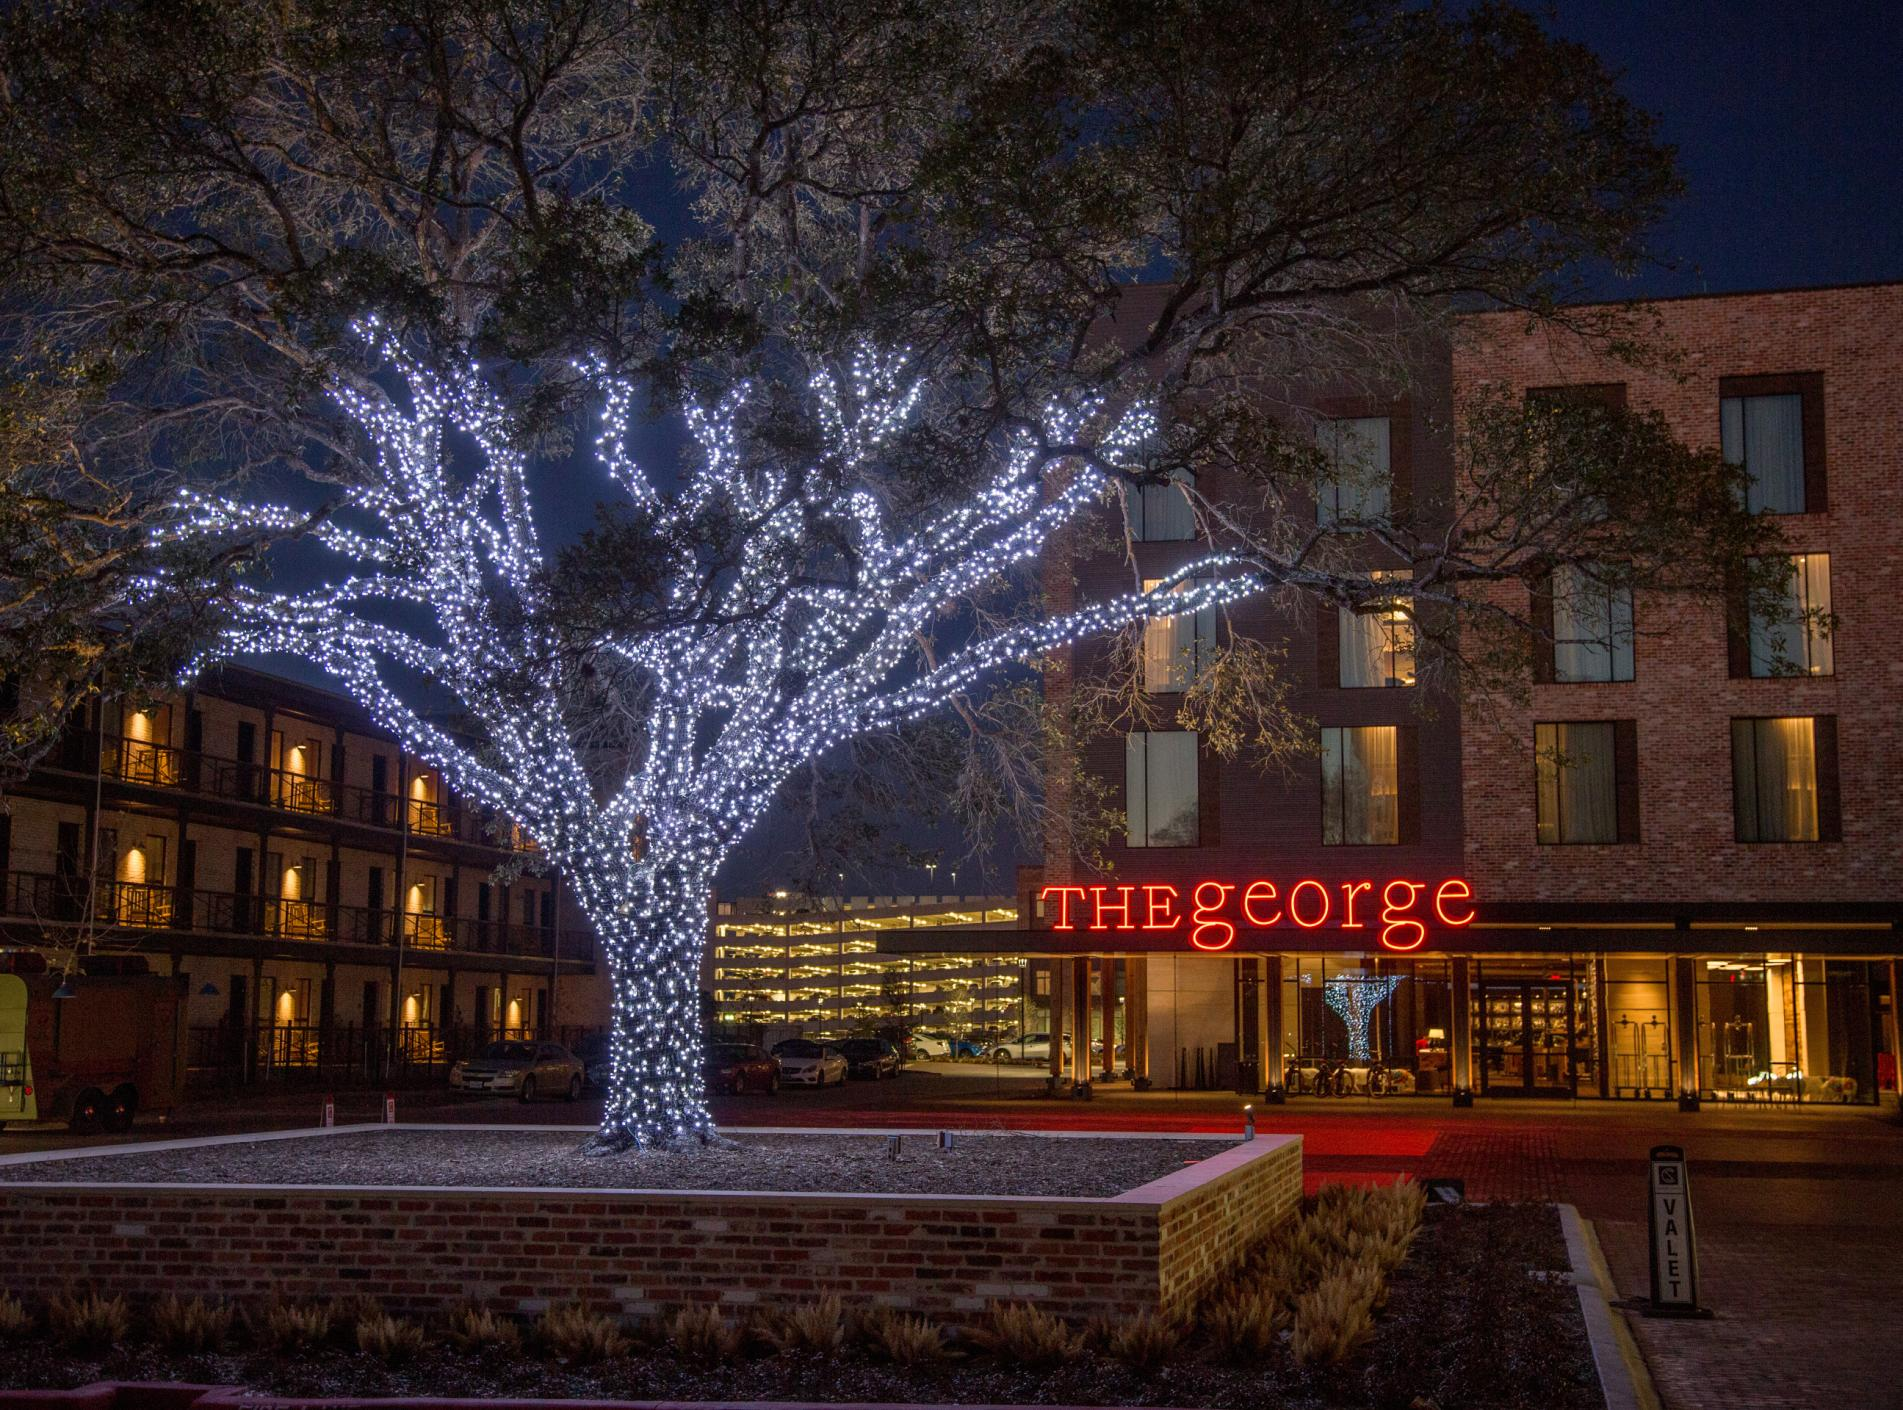 The George Christmas Lights